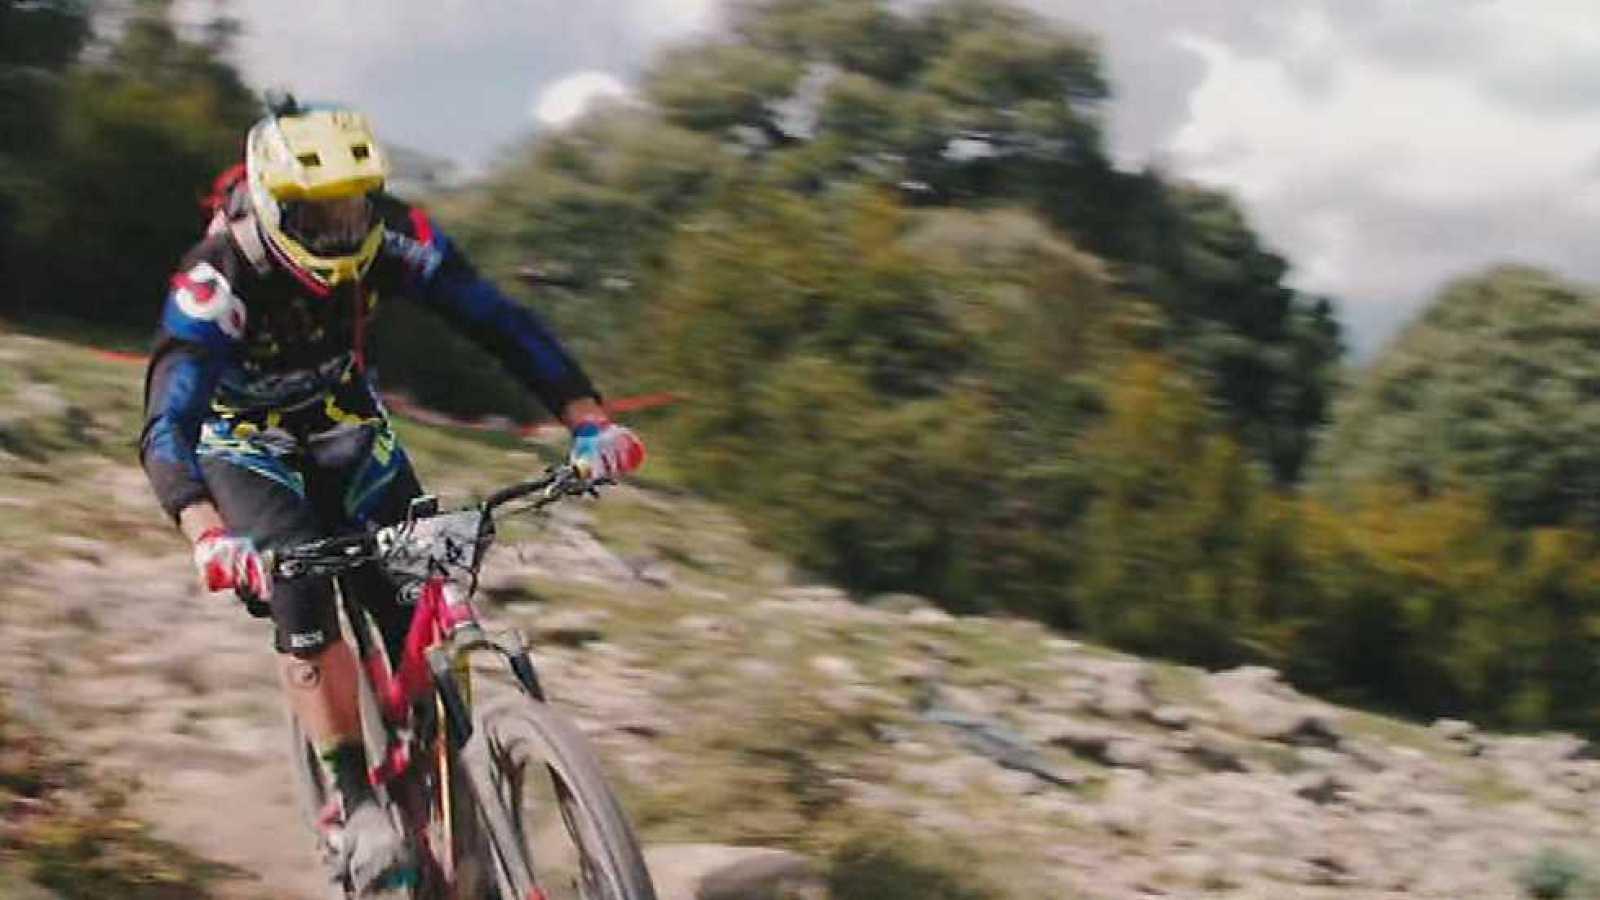 Mountain Bike - Campeonato del mundo de Enduro BTT 2015  - Ver ahora